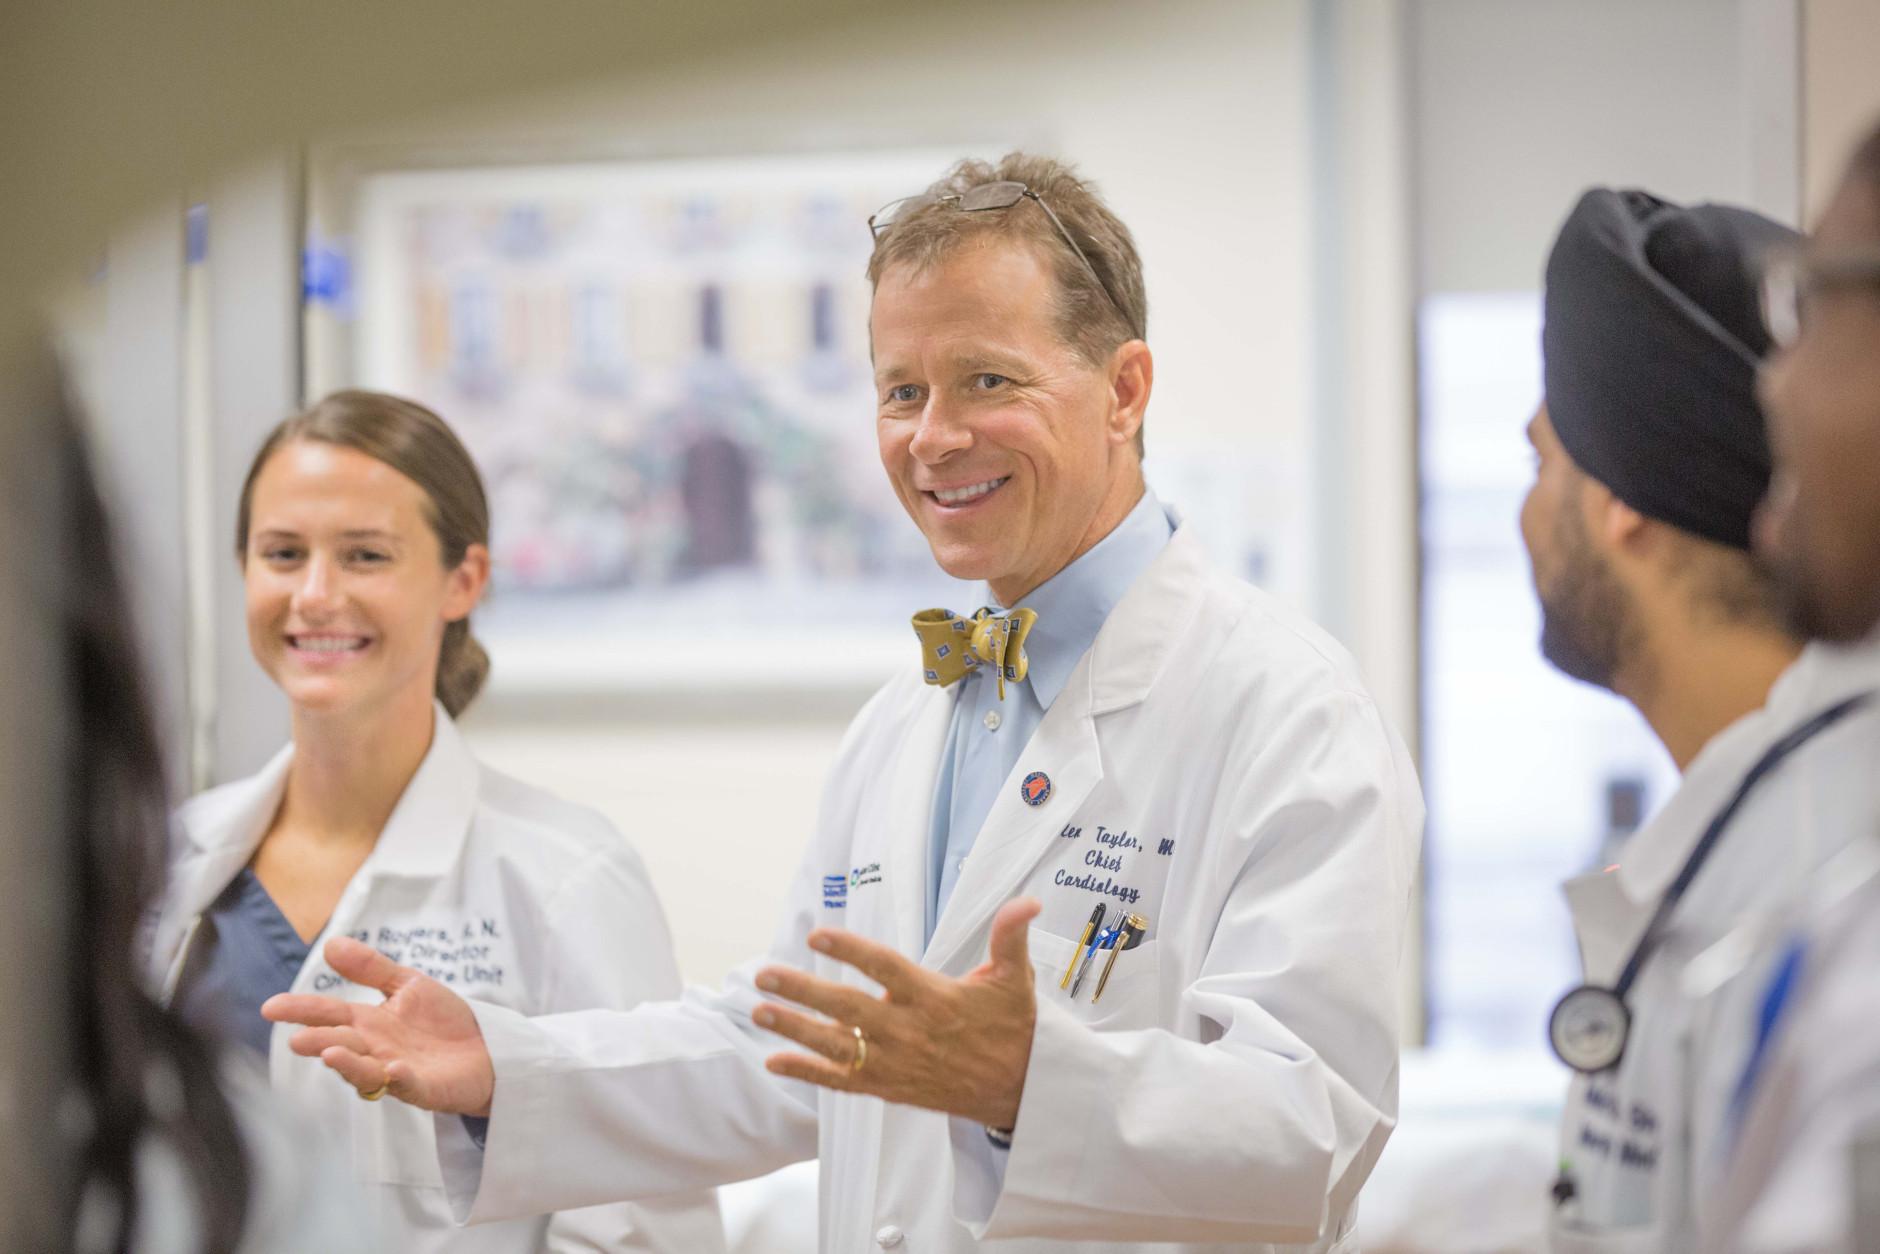 Dr. Allen Taylor, Chief of Cardiology with MedStar Heart & Vascular Institute. (Courtesy MedStar Heart and Vascular Institute)